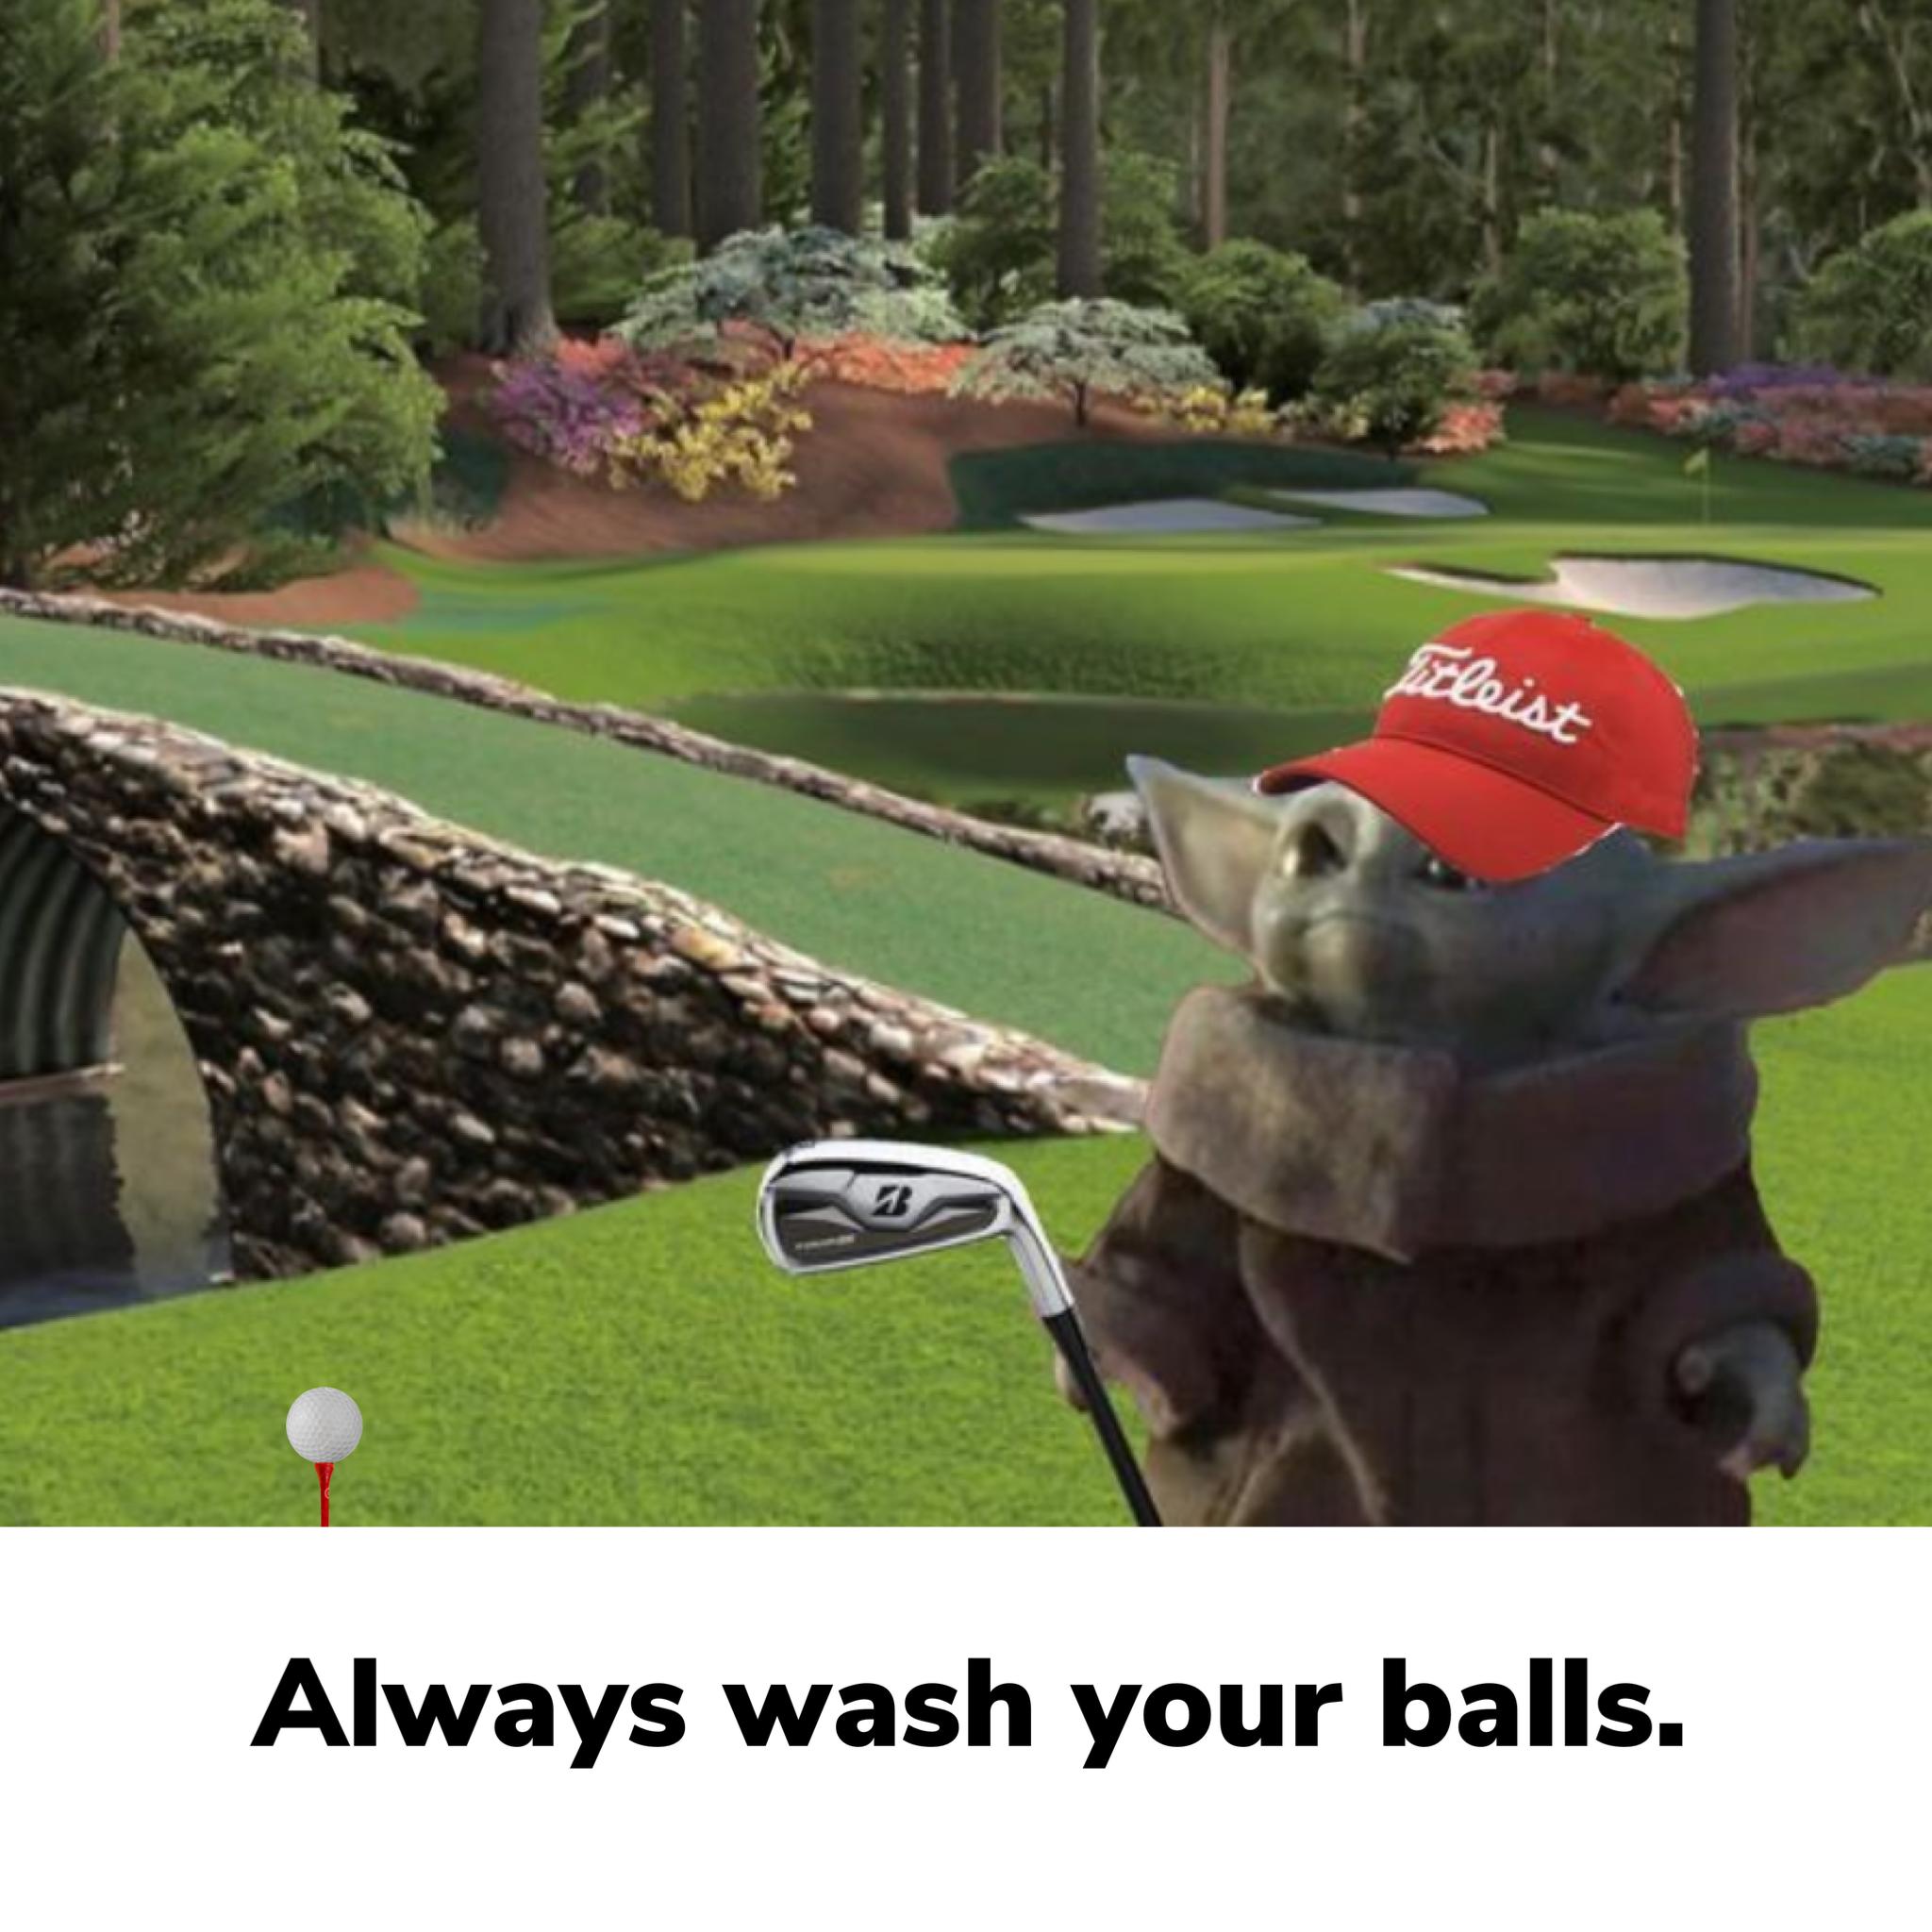 Pin By Jason Campbell On Memes For Baby Yoda In 2021 Garden Sculpture Yoda Outdoor